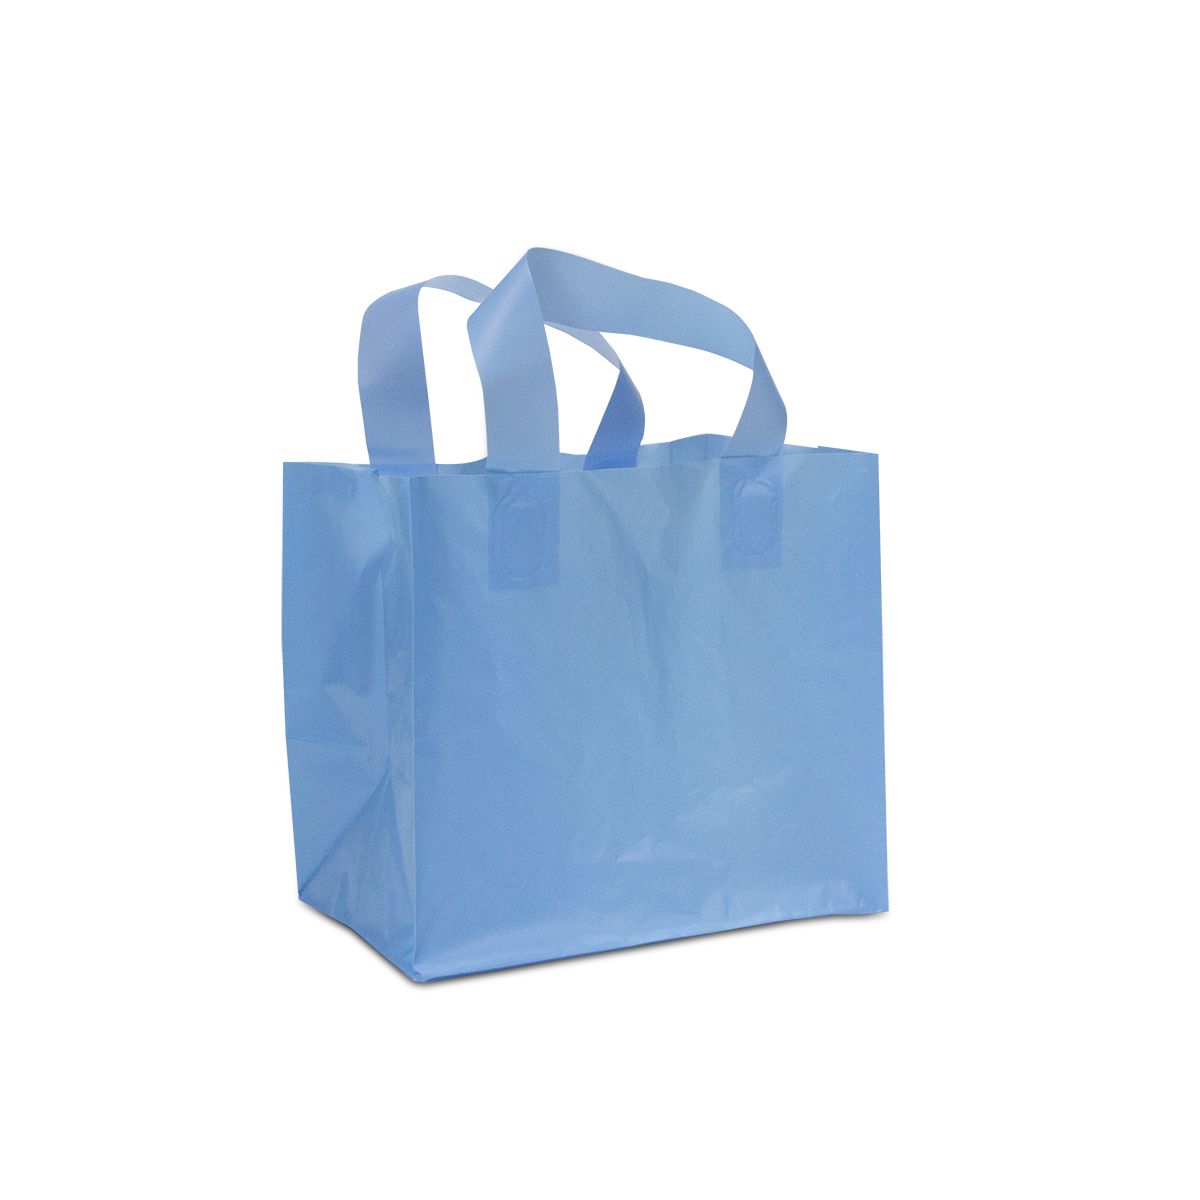 Plastic take away tassen